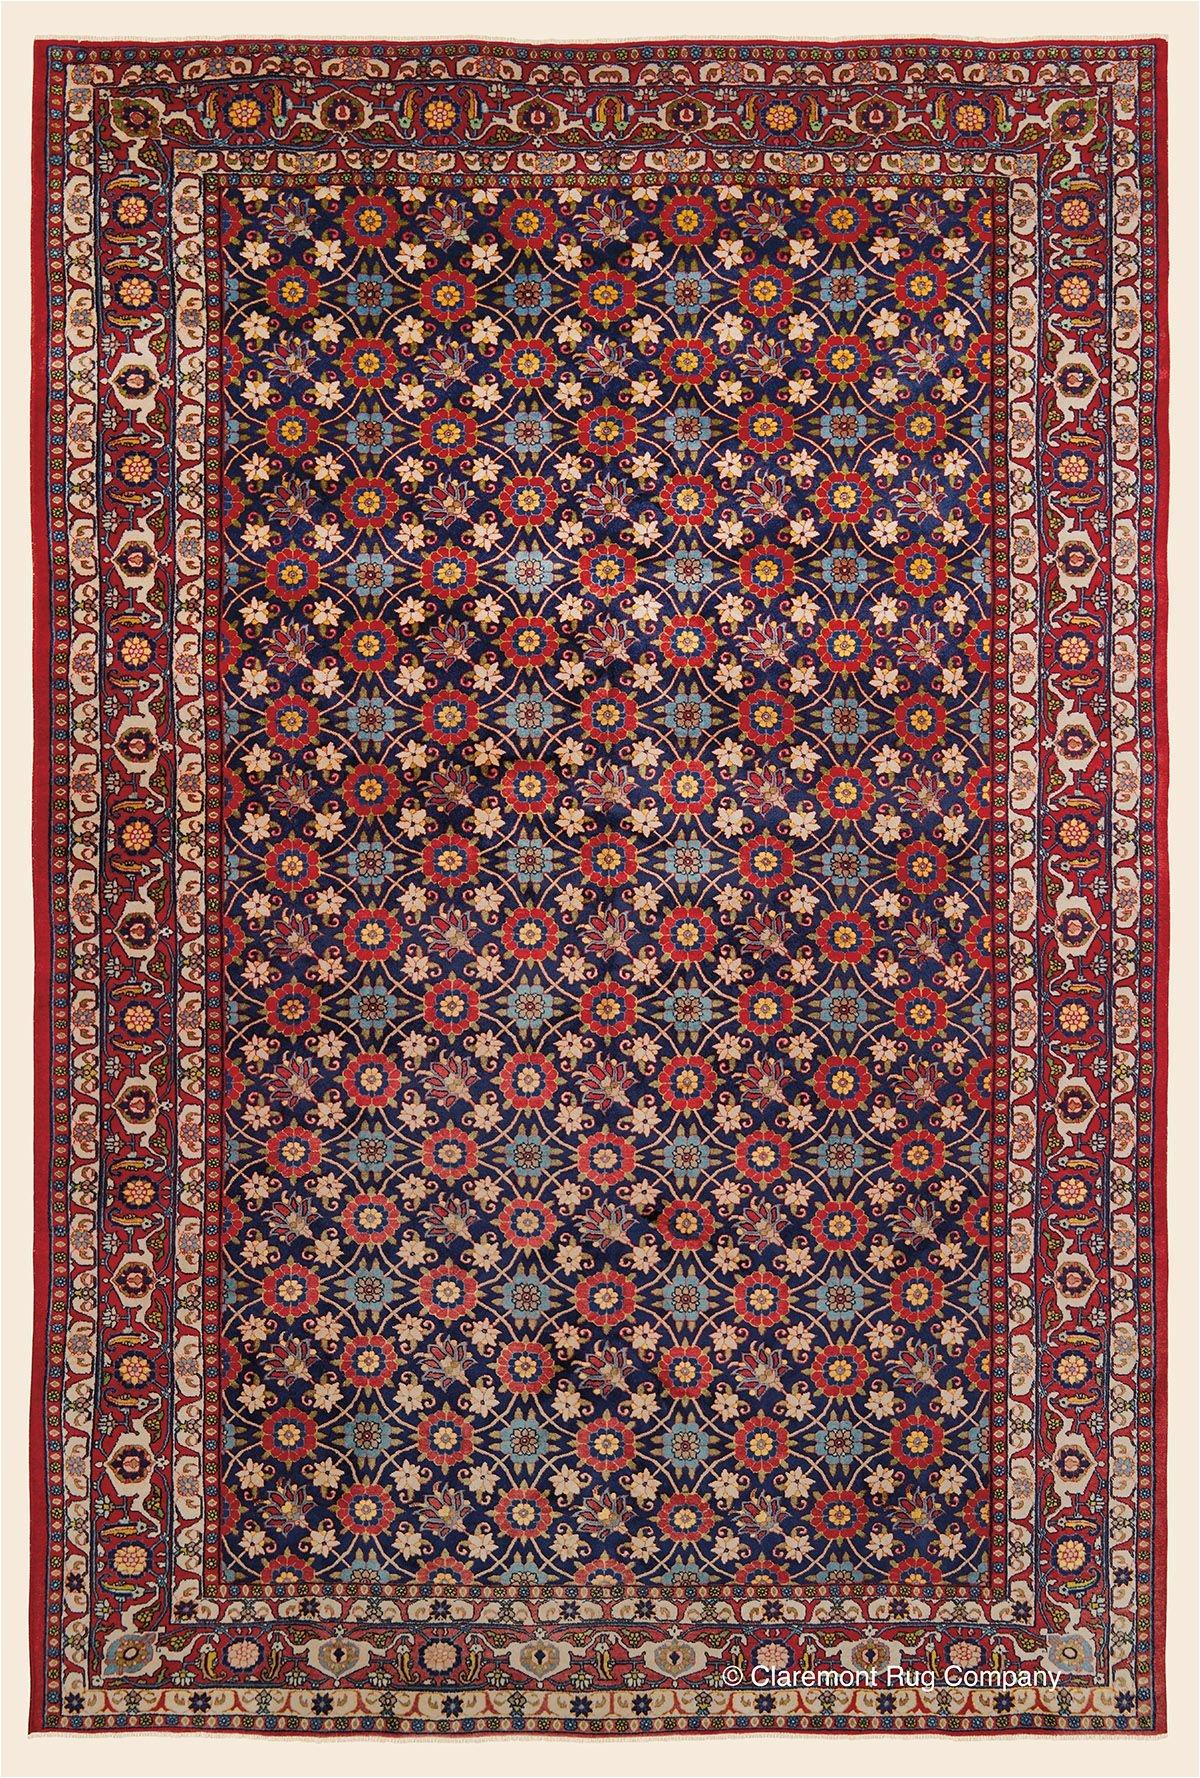 antique circa 1925 northern persian high decorative veramin rug 7 1 x 10